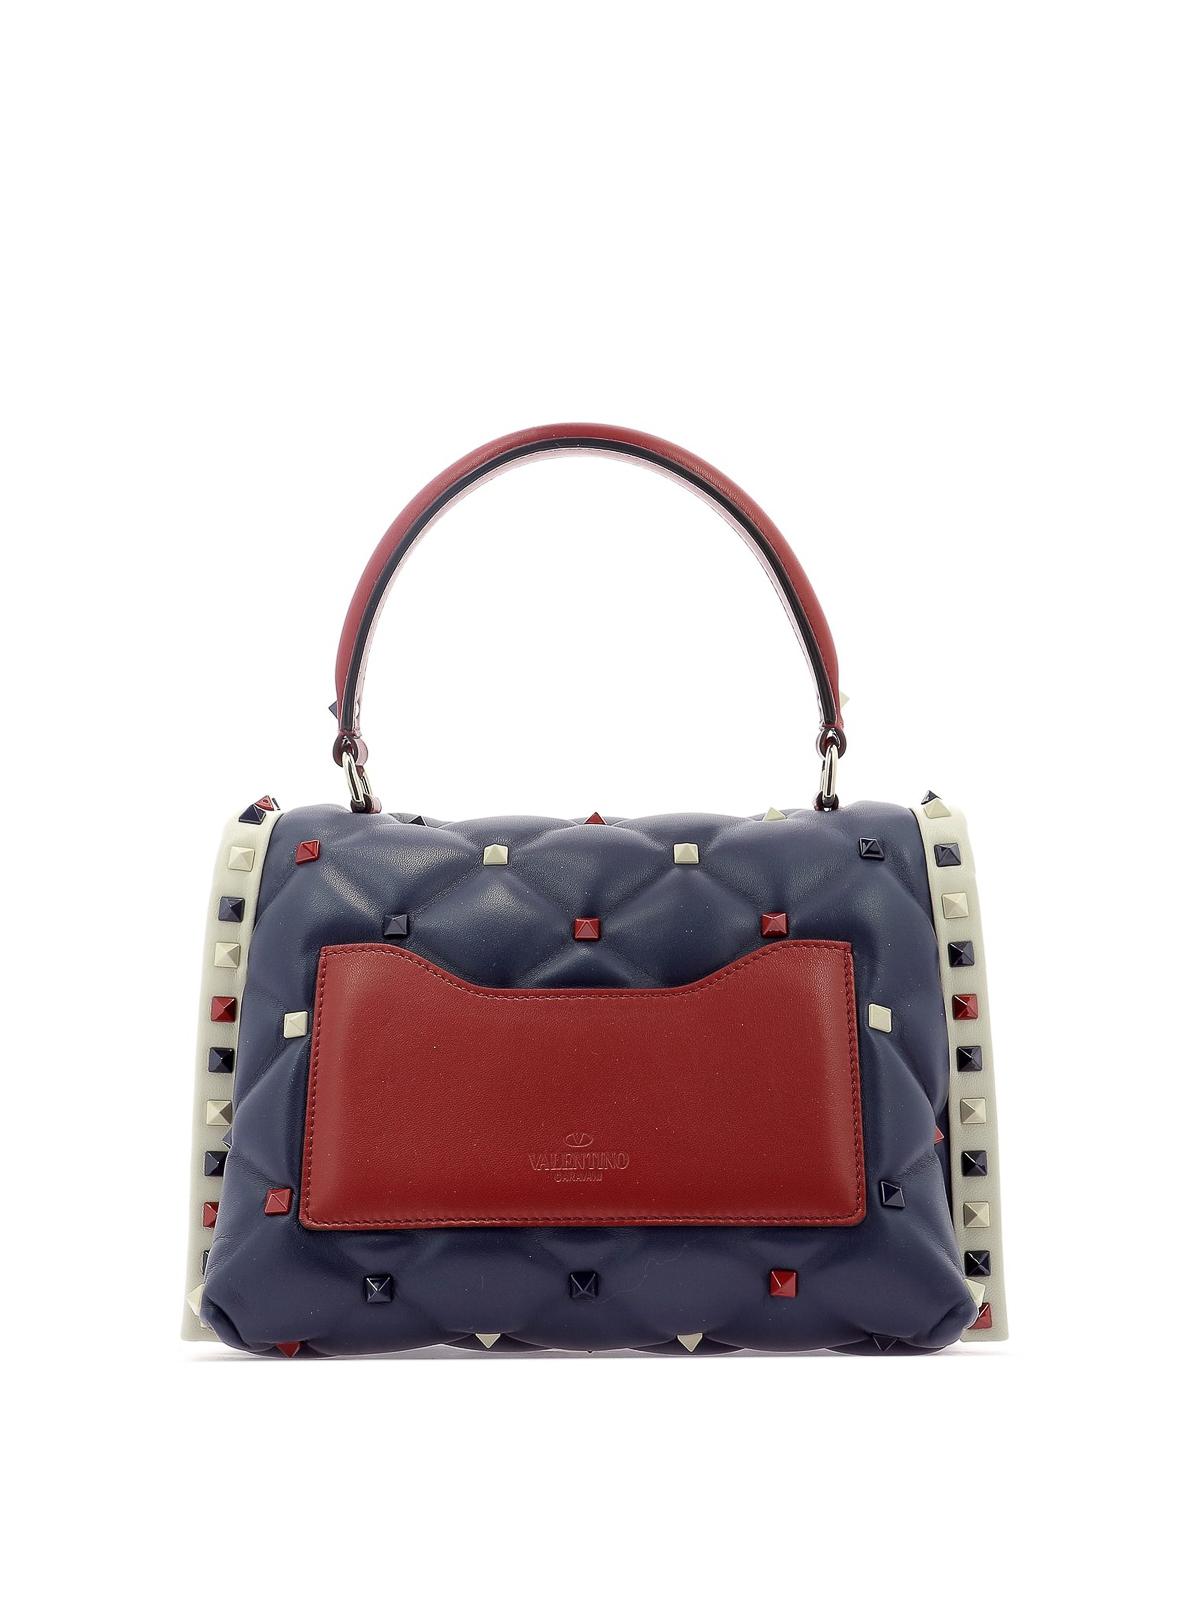 c0a83f6f5779 iKRIX VALENTINO GARAVANI  bowling bags - Candystud M quilted lambskin  handbag